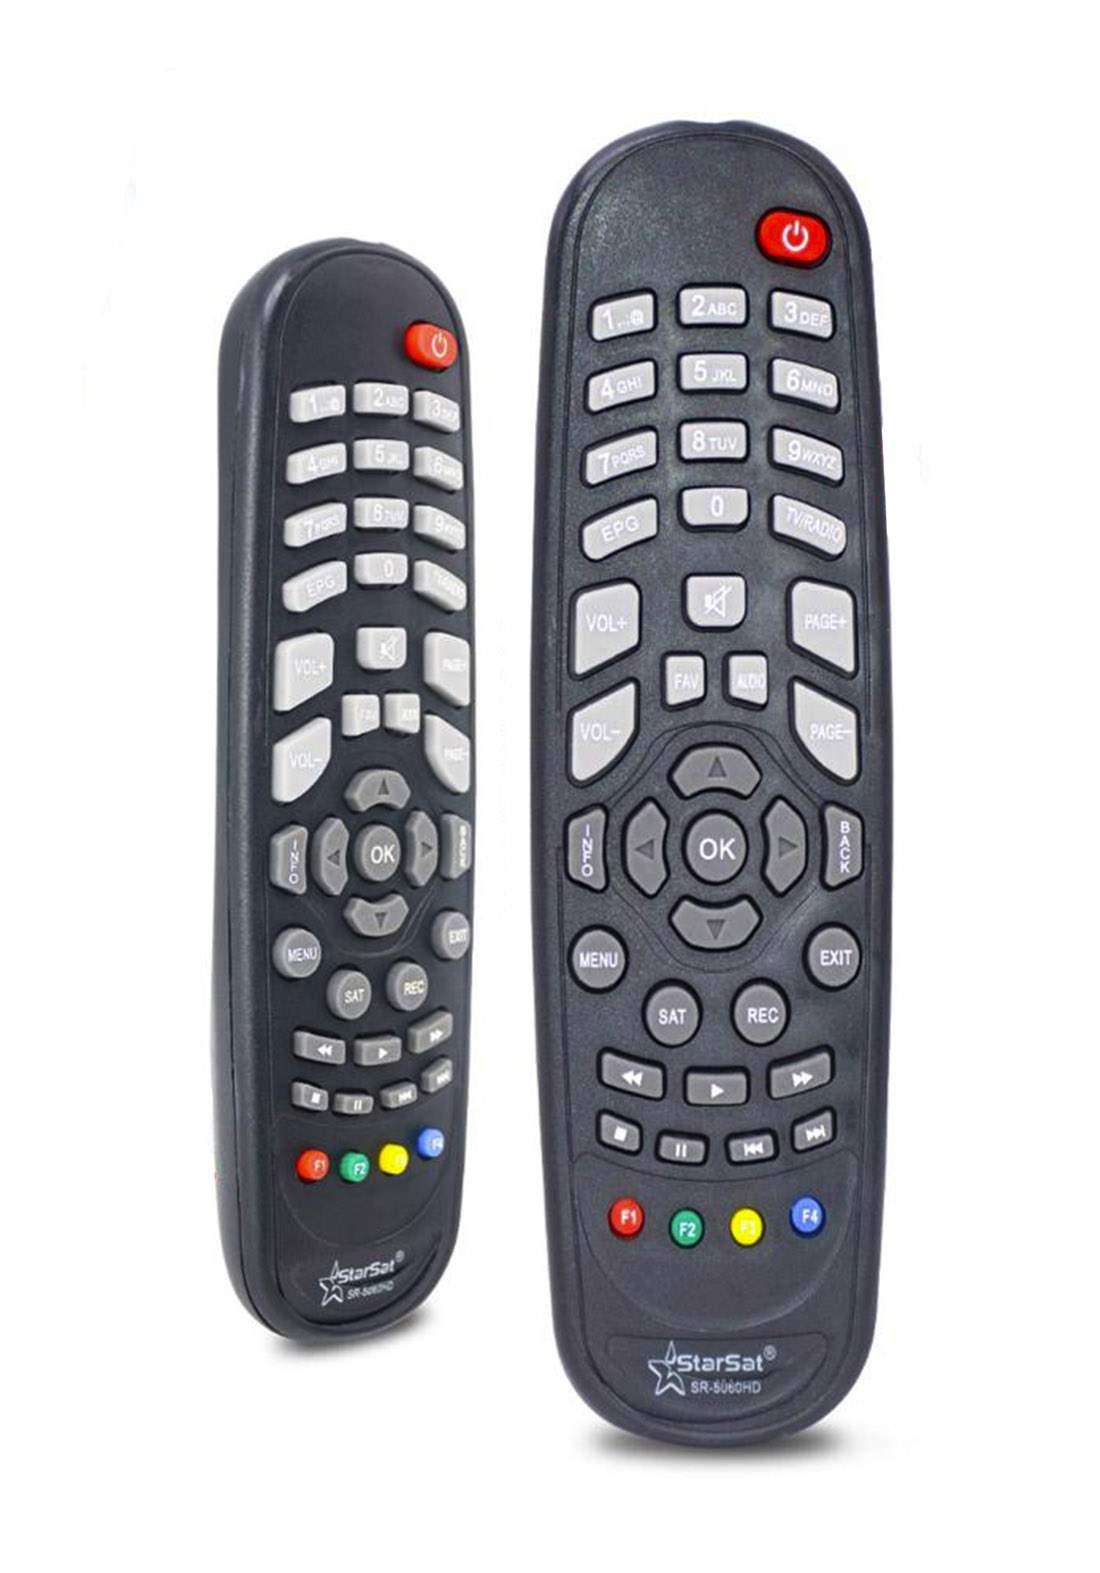 Remote Control For Star Sat Plasma TV (A-733) جهاز تحكم عن بعد